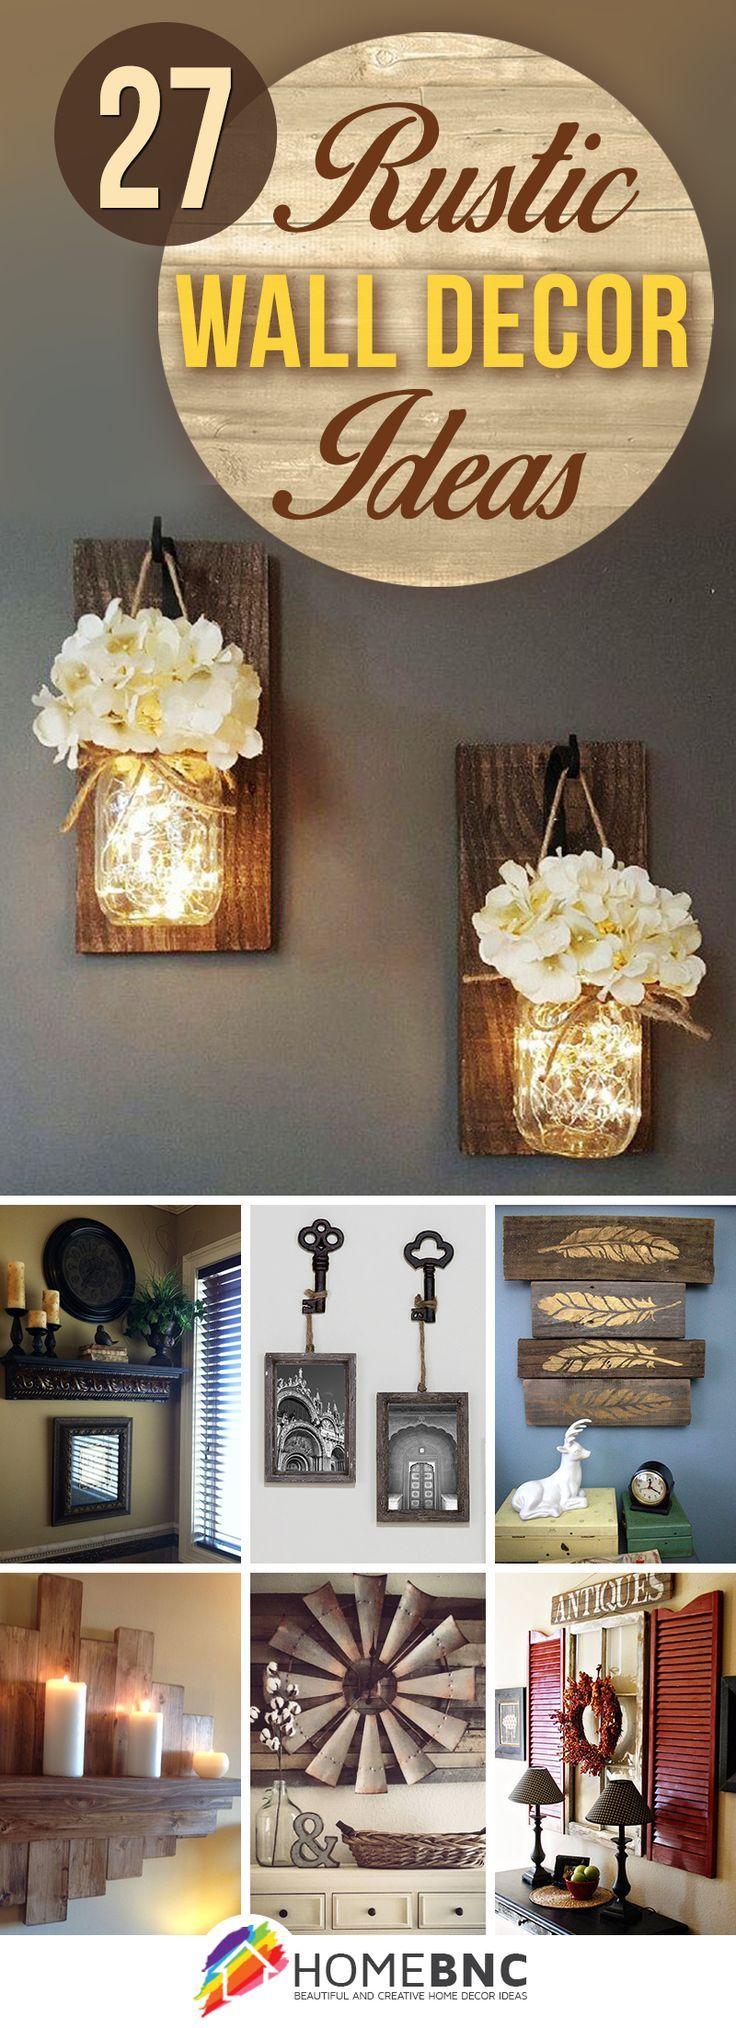 Rustikales badezimmer dekor diy  rustic wall decor ideas to turn shabby into fabulous  rustic